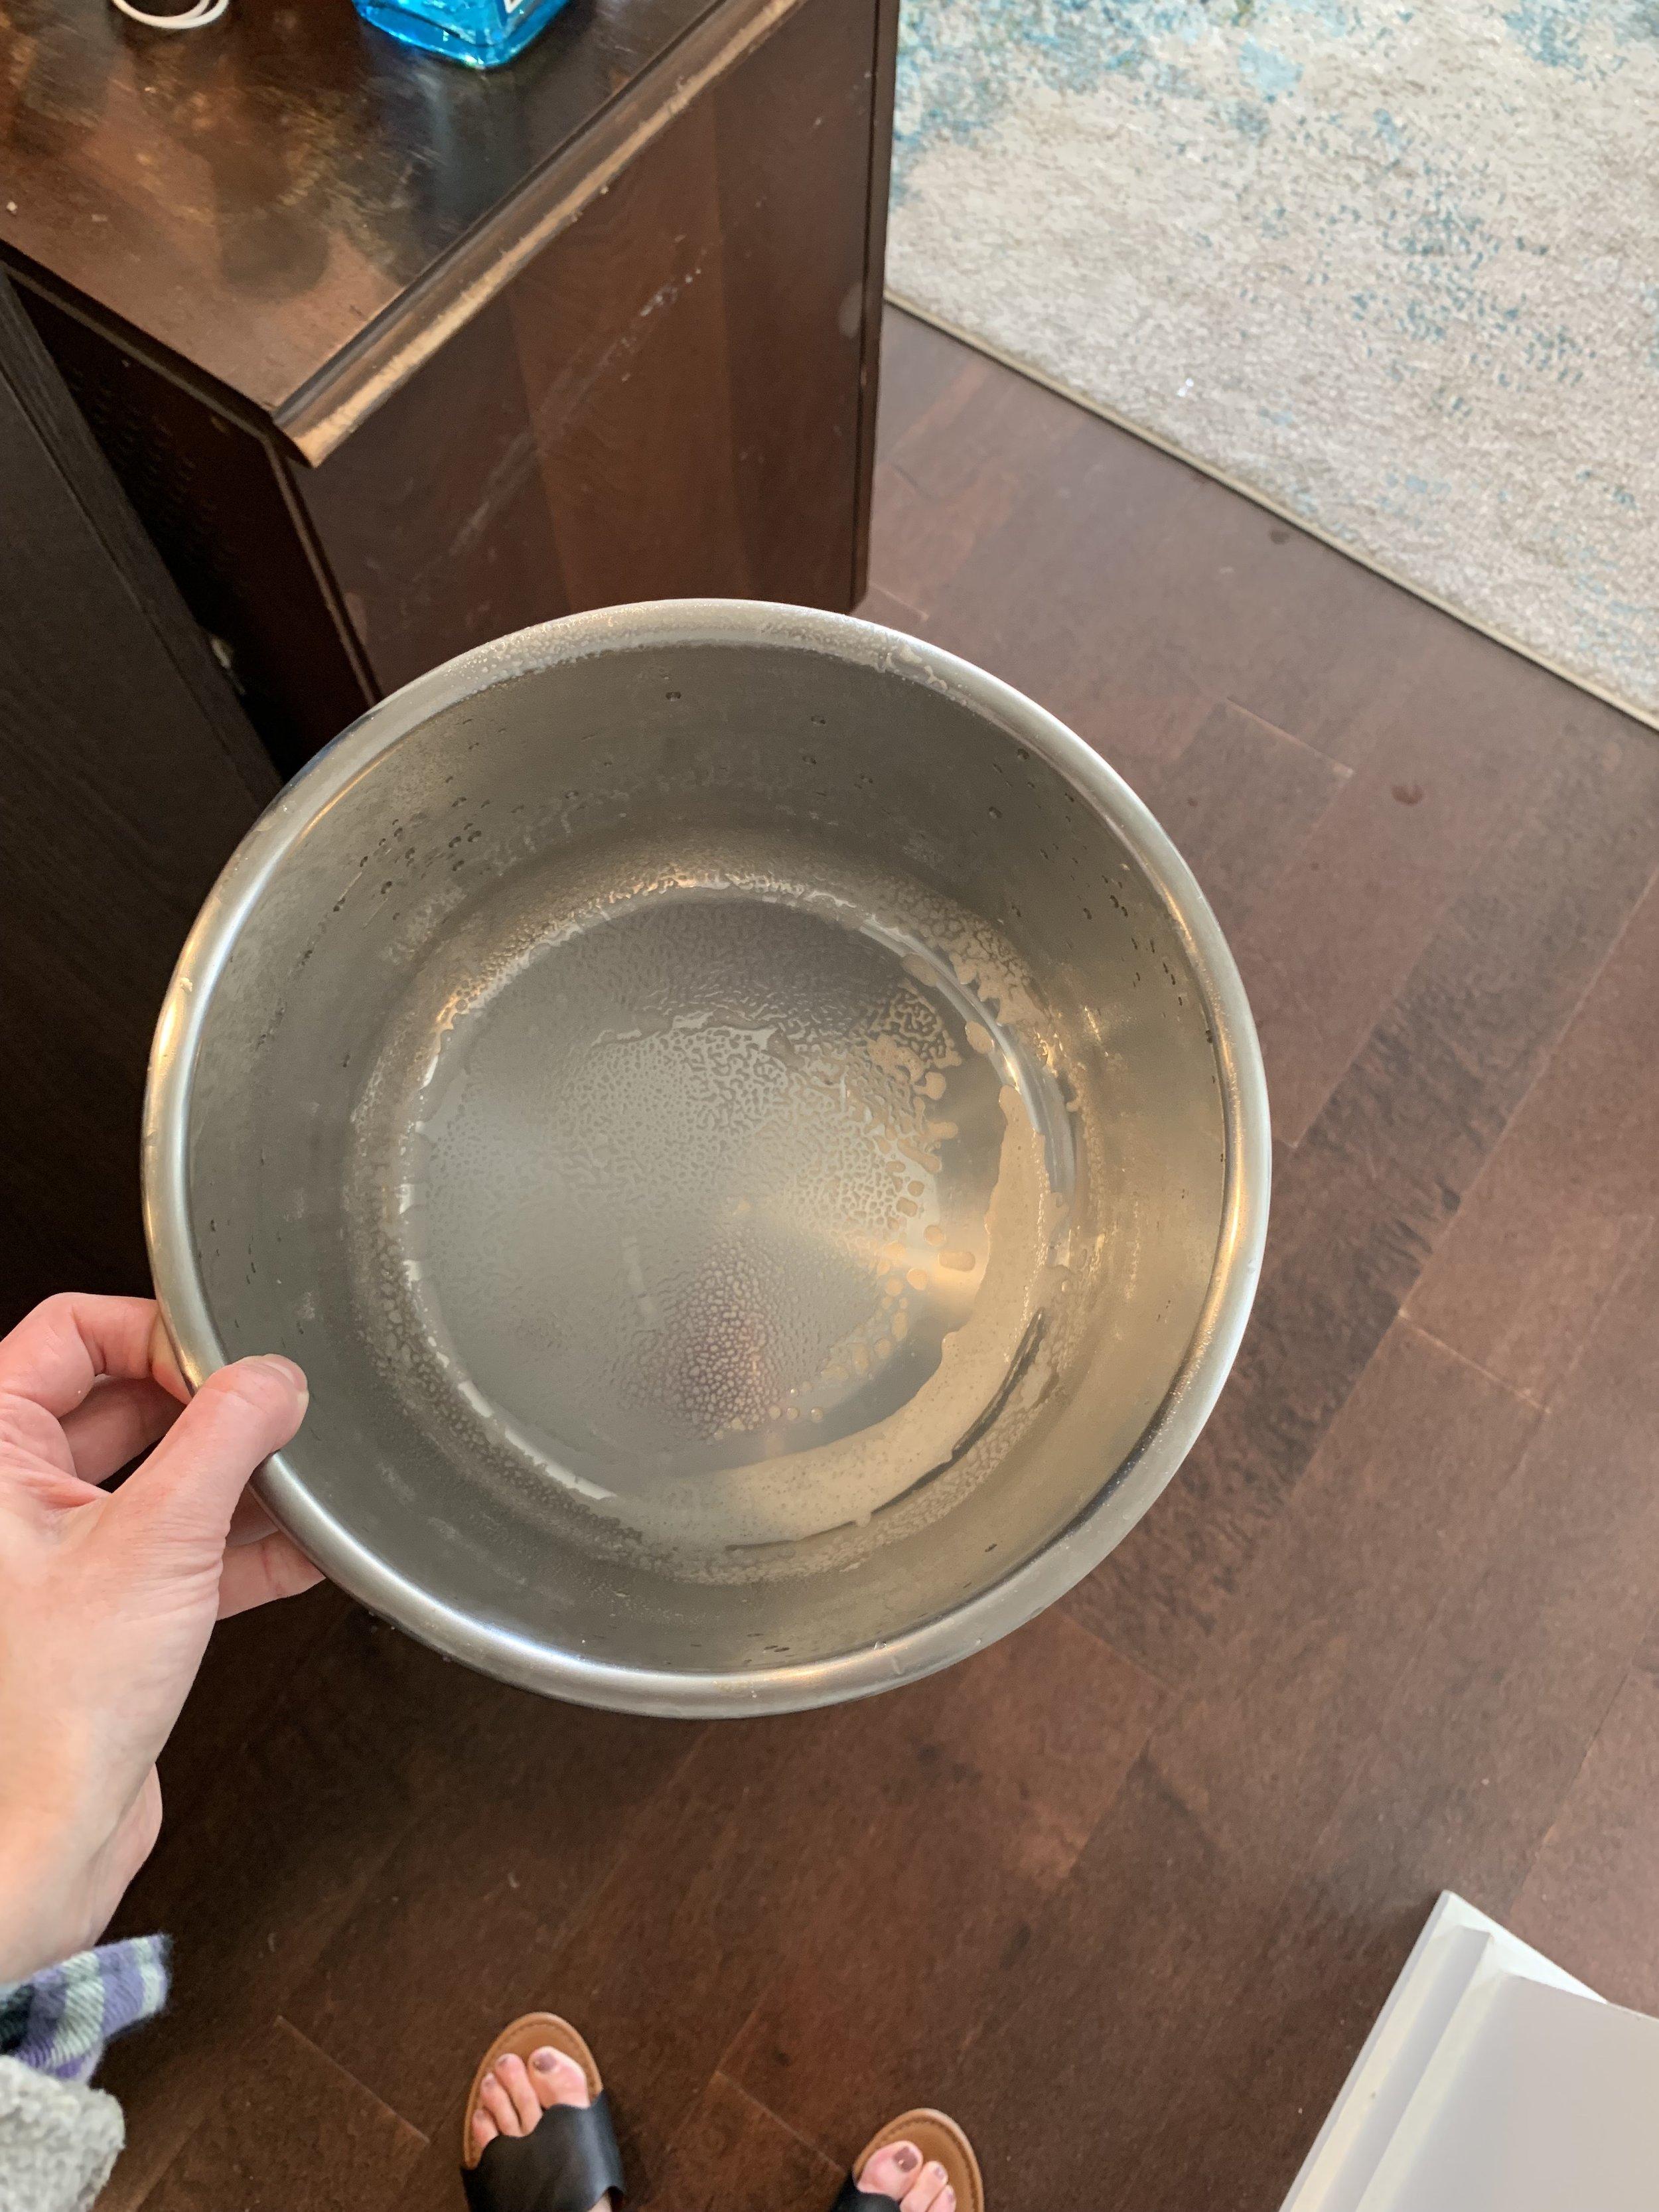 Instant Pot Spray Pot with Oil Spray